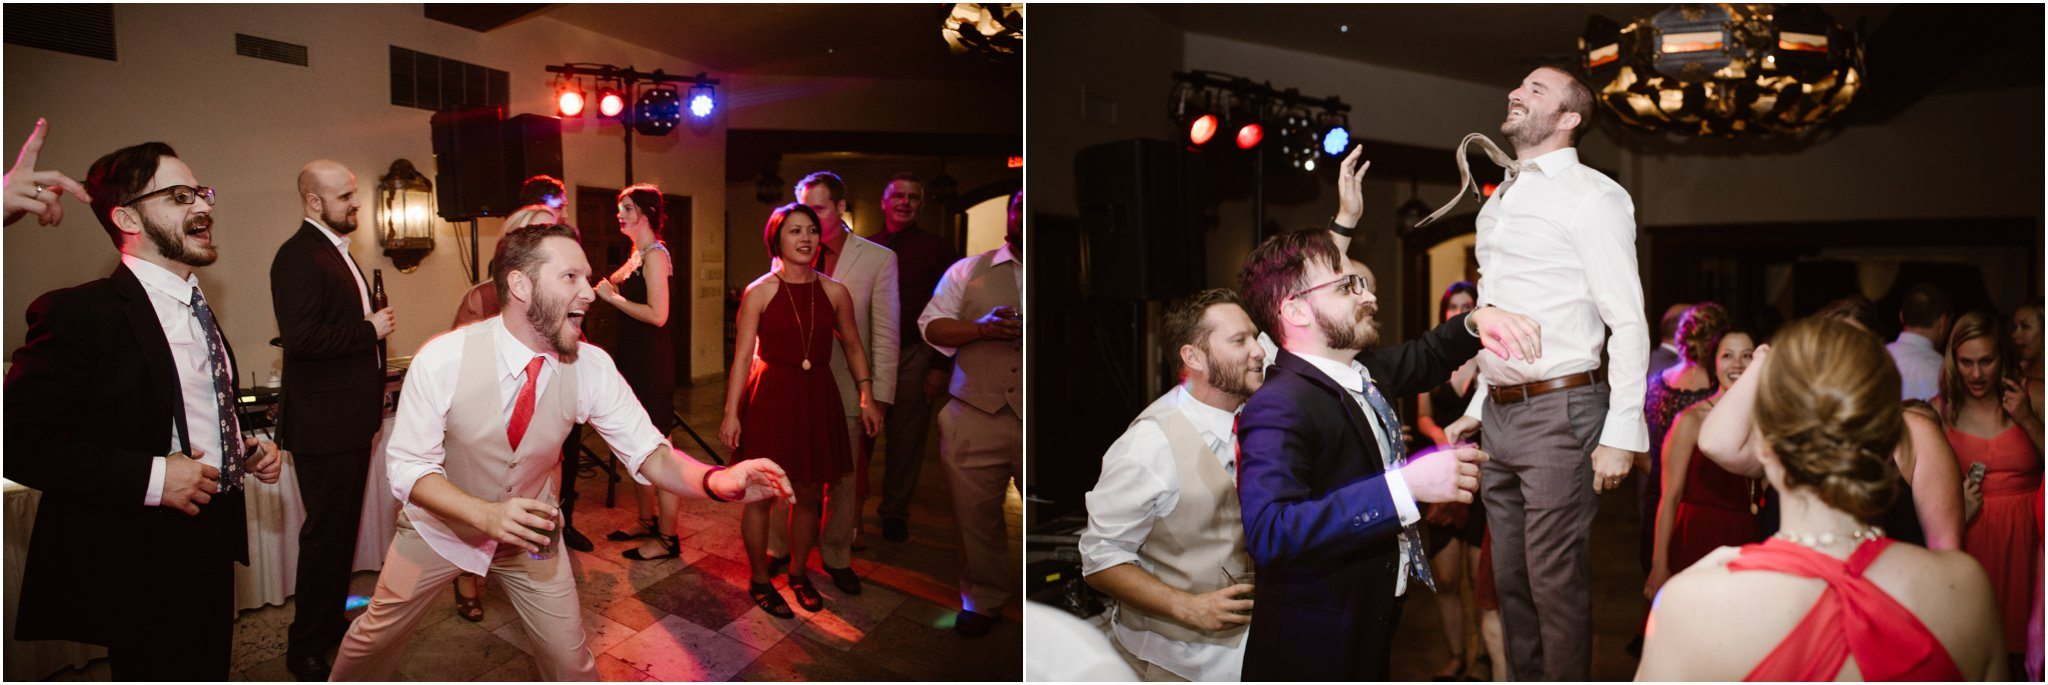 0095albuquerque-wedding-photographer_-santa-fe-wedding-photographer_-southwest-wedding-photography_-blue-rose-studio